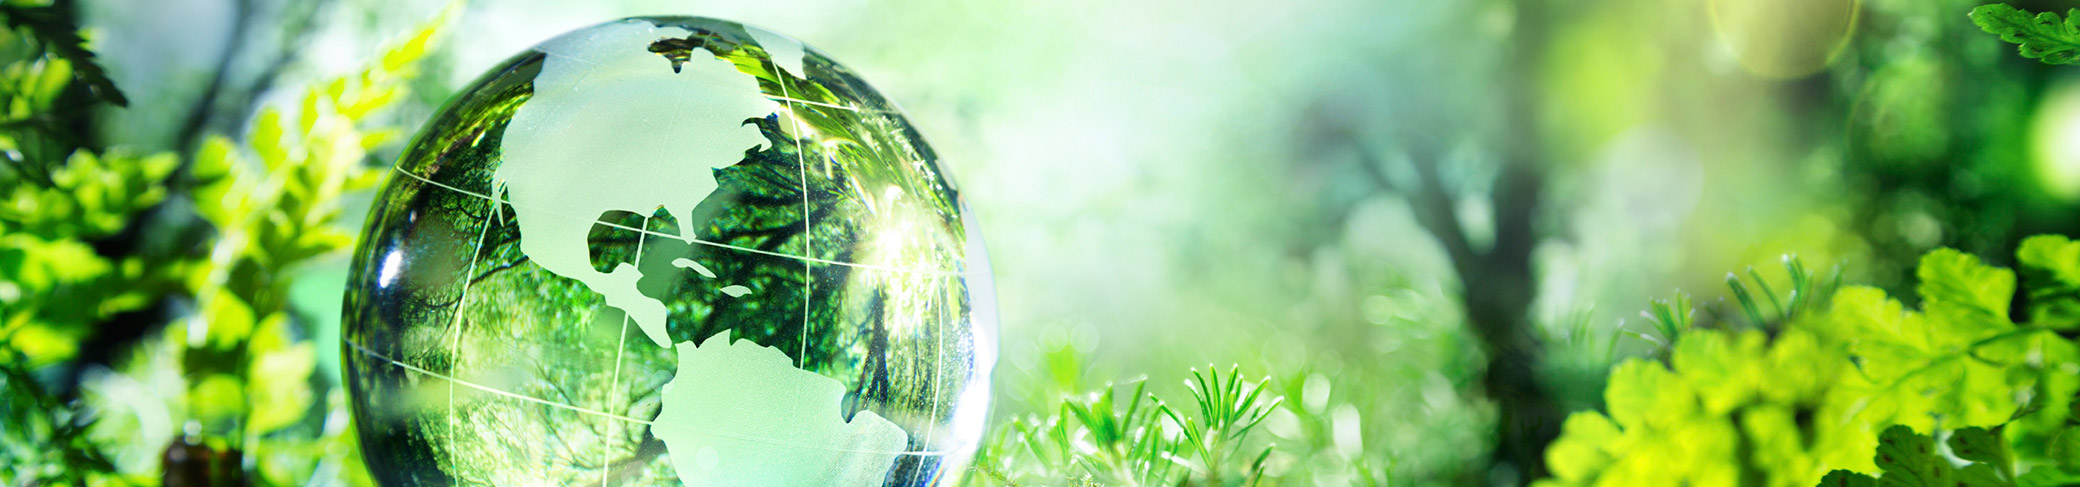 sustainability-banner-1906504831.jpg